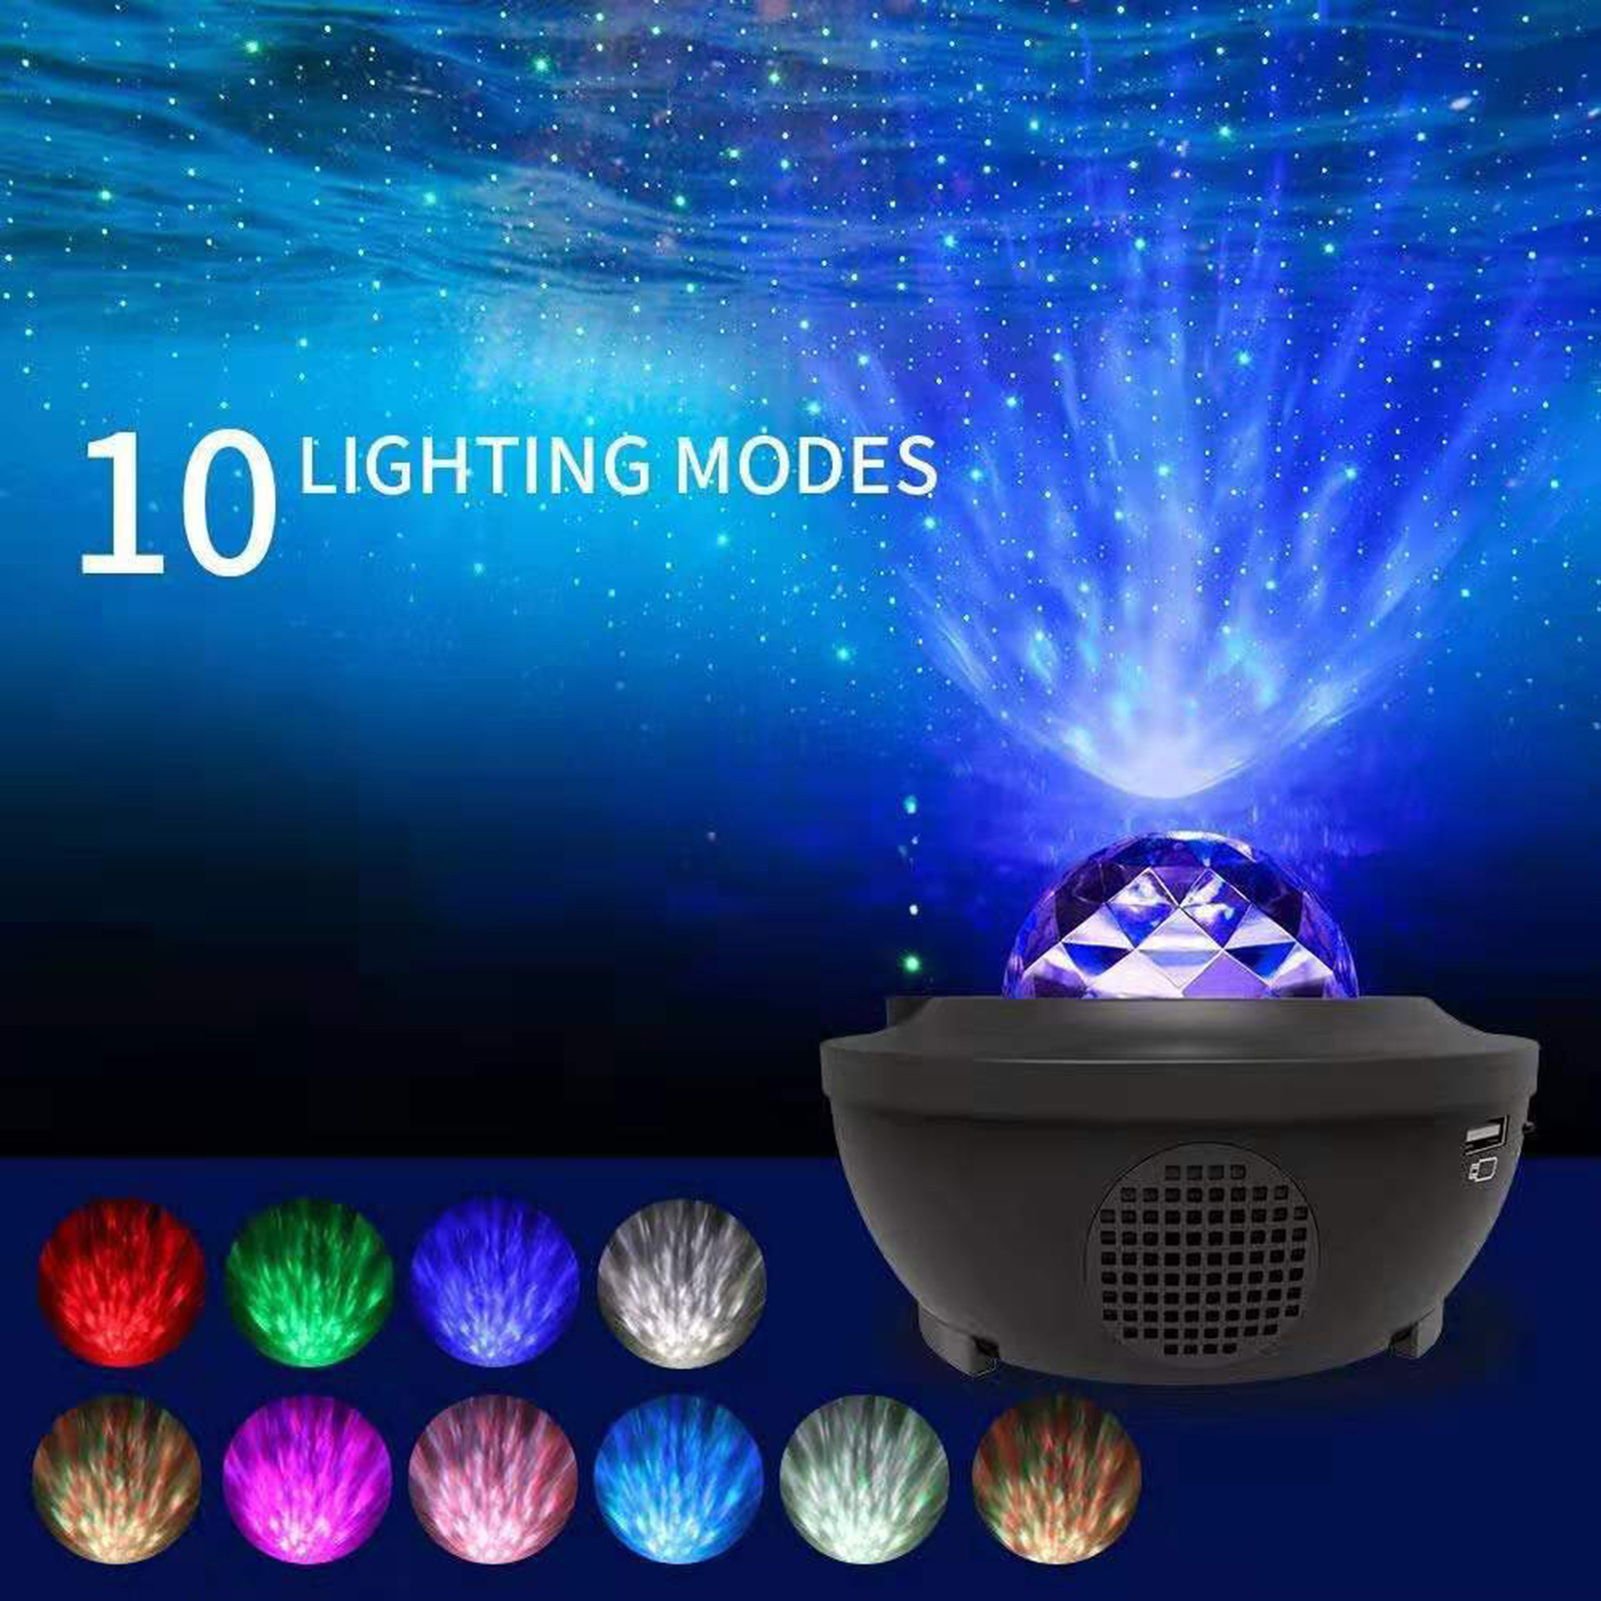 Kleurrijke Sterrenhemel Galaxy Projector Blueteeth Usb Voice Control Muziekspeler Led Nachtlampje Usb Opladen Projectielamp Gift